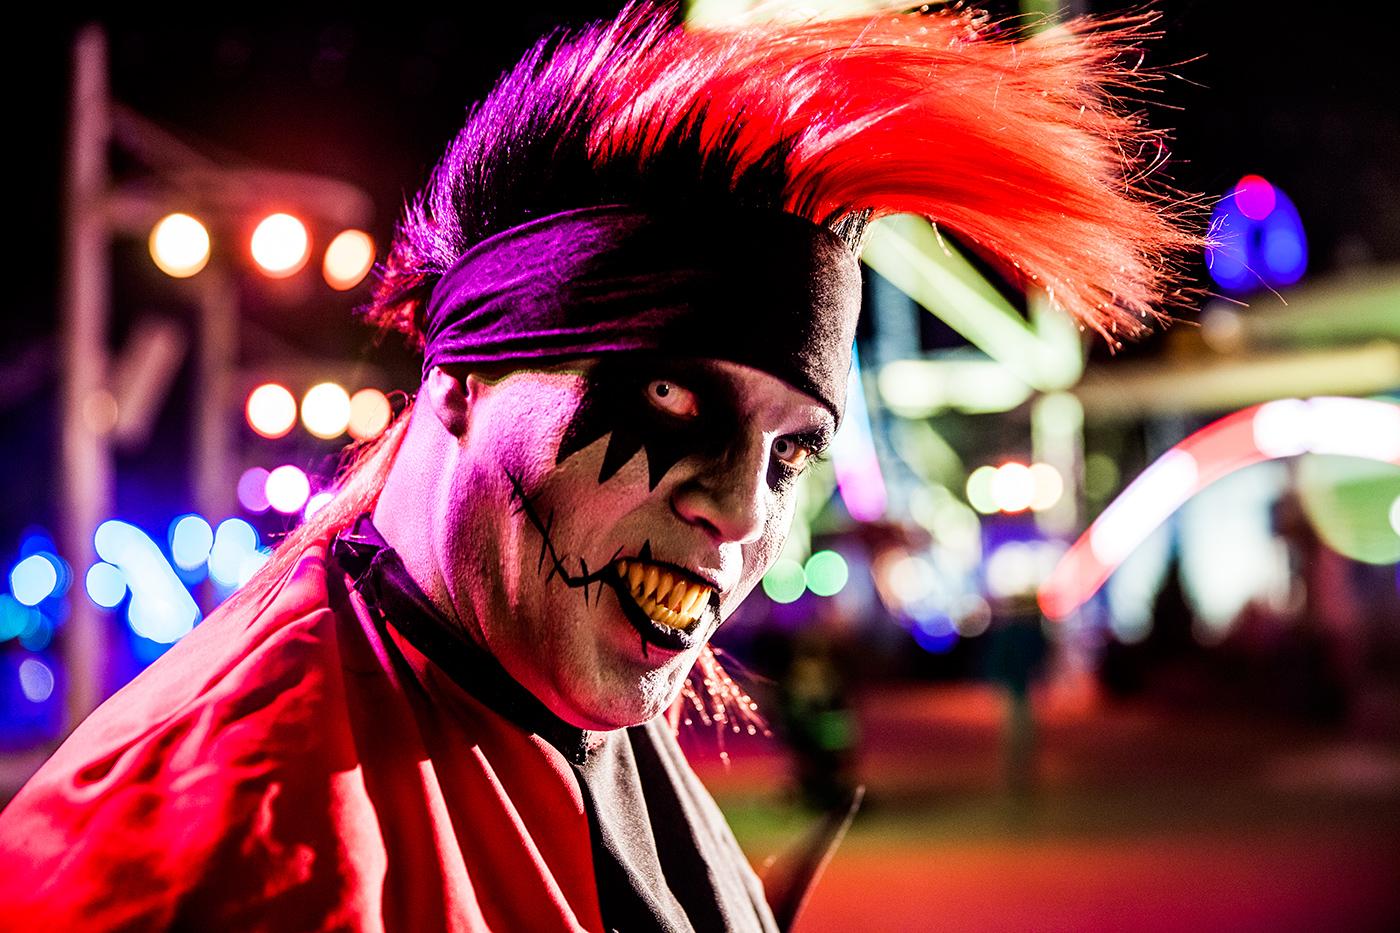 halloweekends_clown.jpg